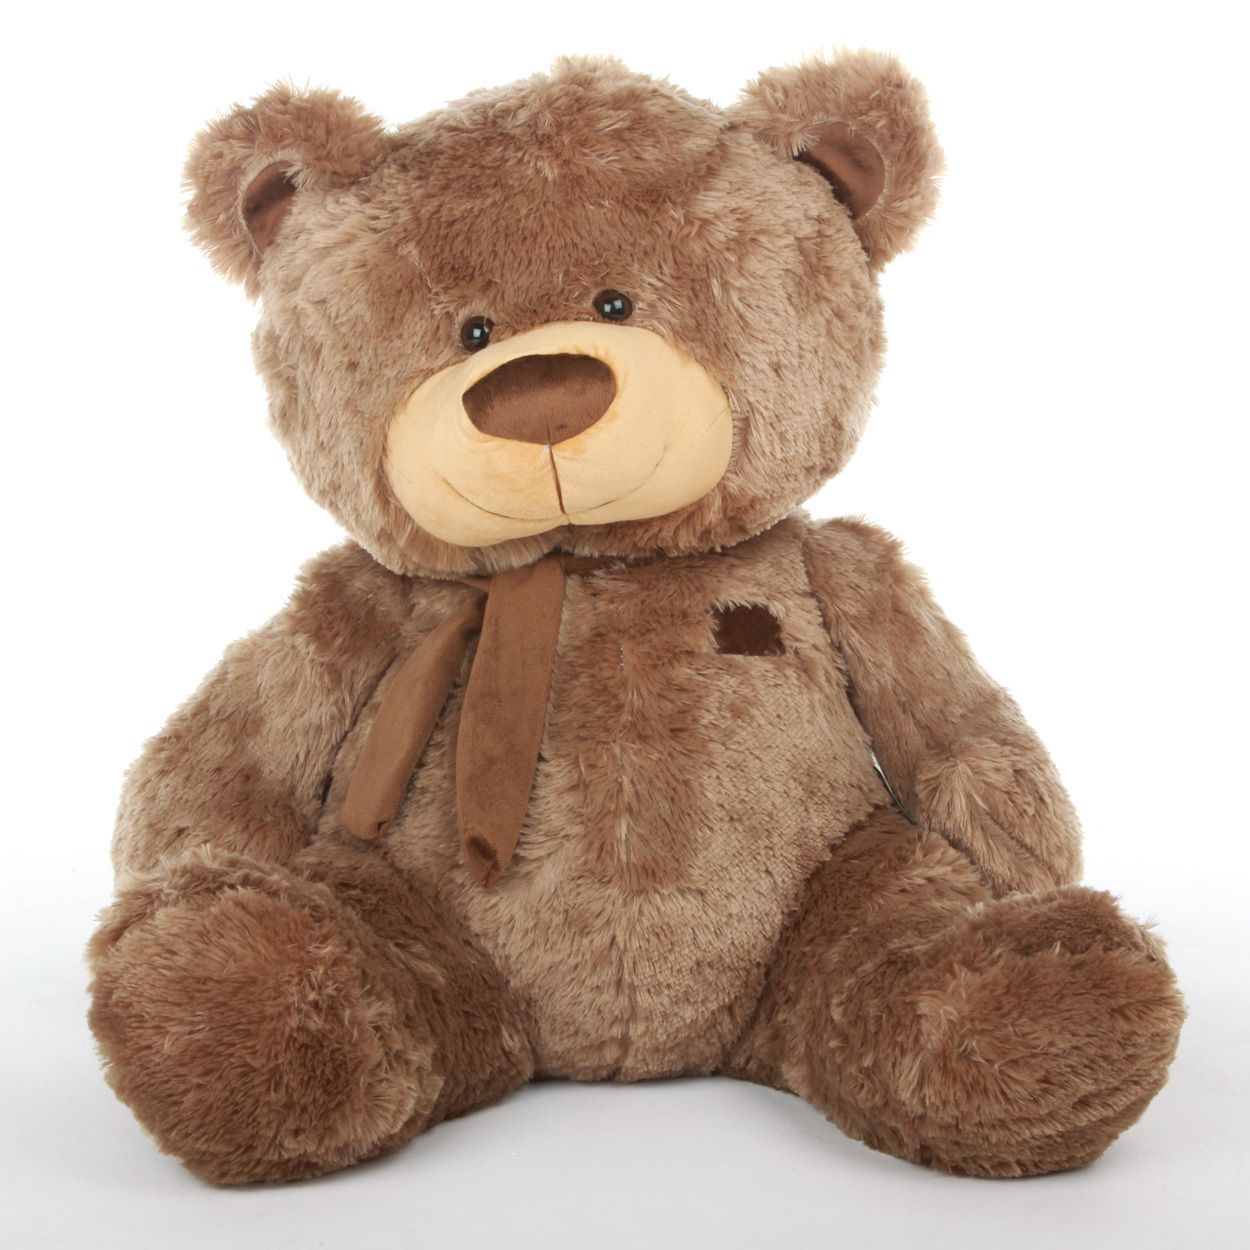 af2c92c28f703 Giant Teddy - Sweetie Tubs Extra Cuddly and Giant Mocha Brown Teddy Bear 52  inch - Giant Teddy